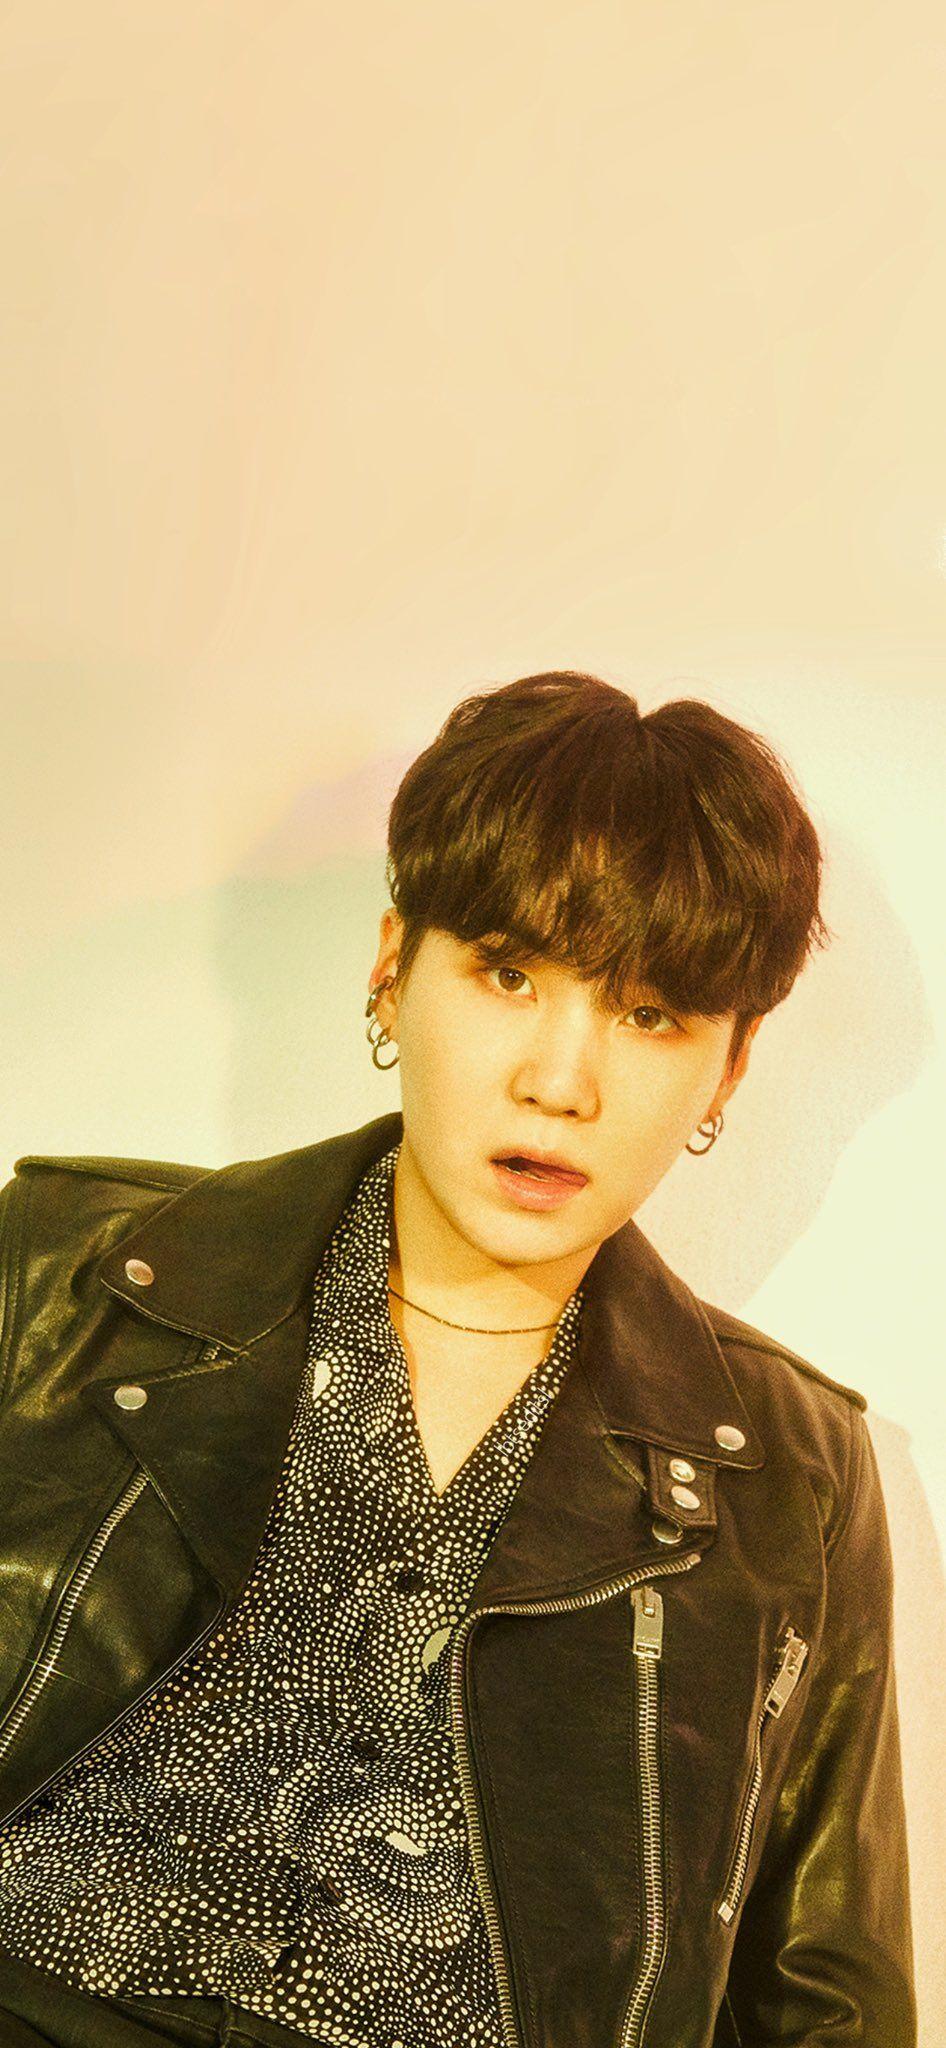 On Twitter In 2021 Min Yoongi Wallpaper Min Yoongi Park Jimin Bts Wallpaper Bts suga wallpaper hd 2021